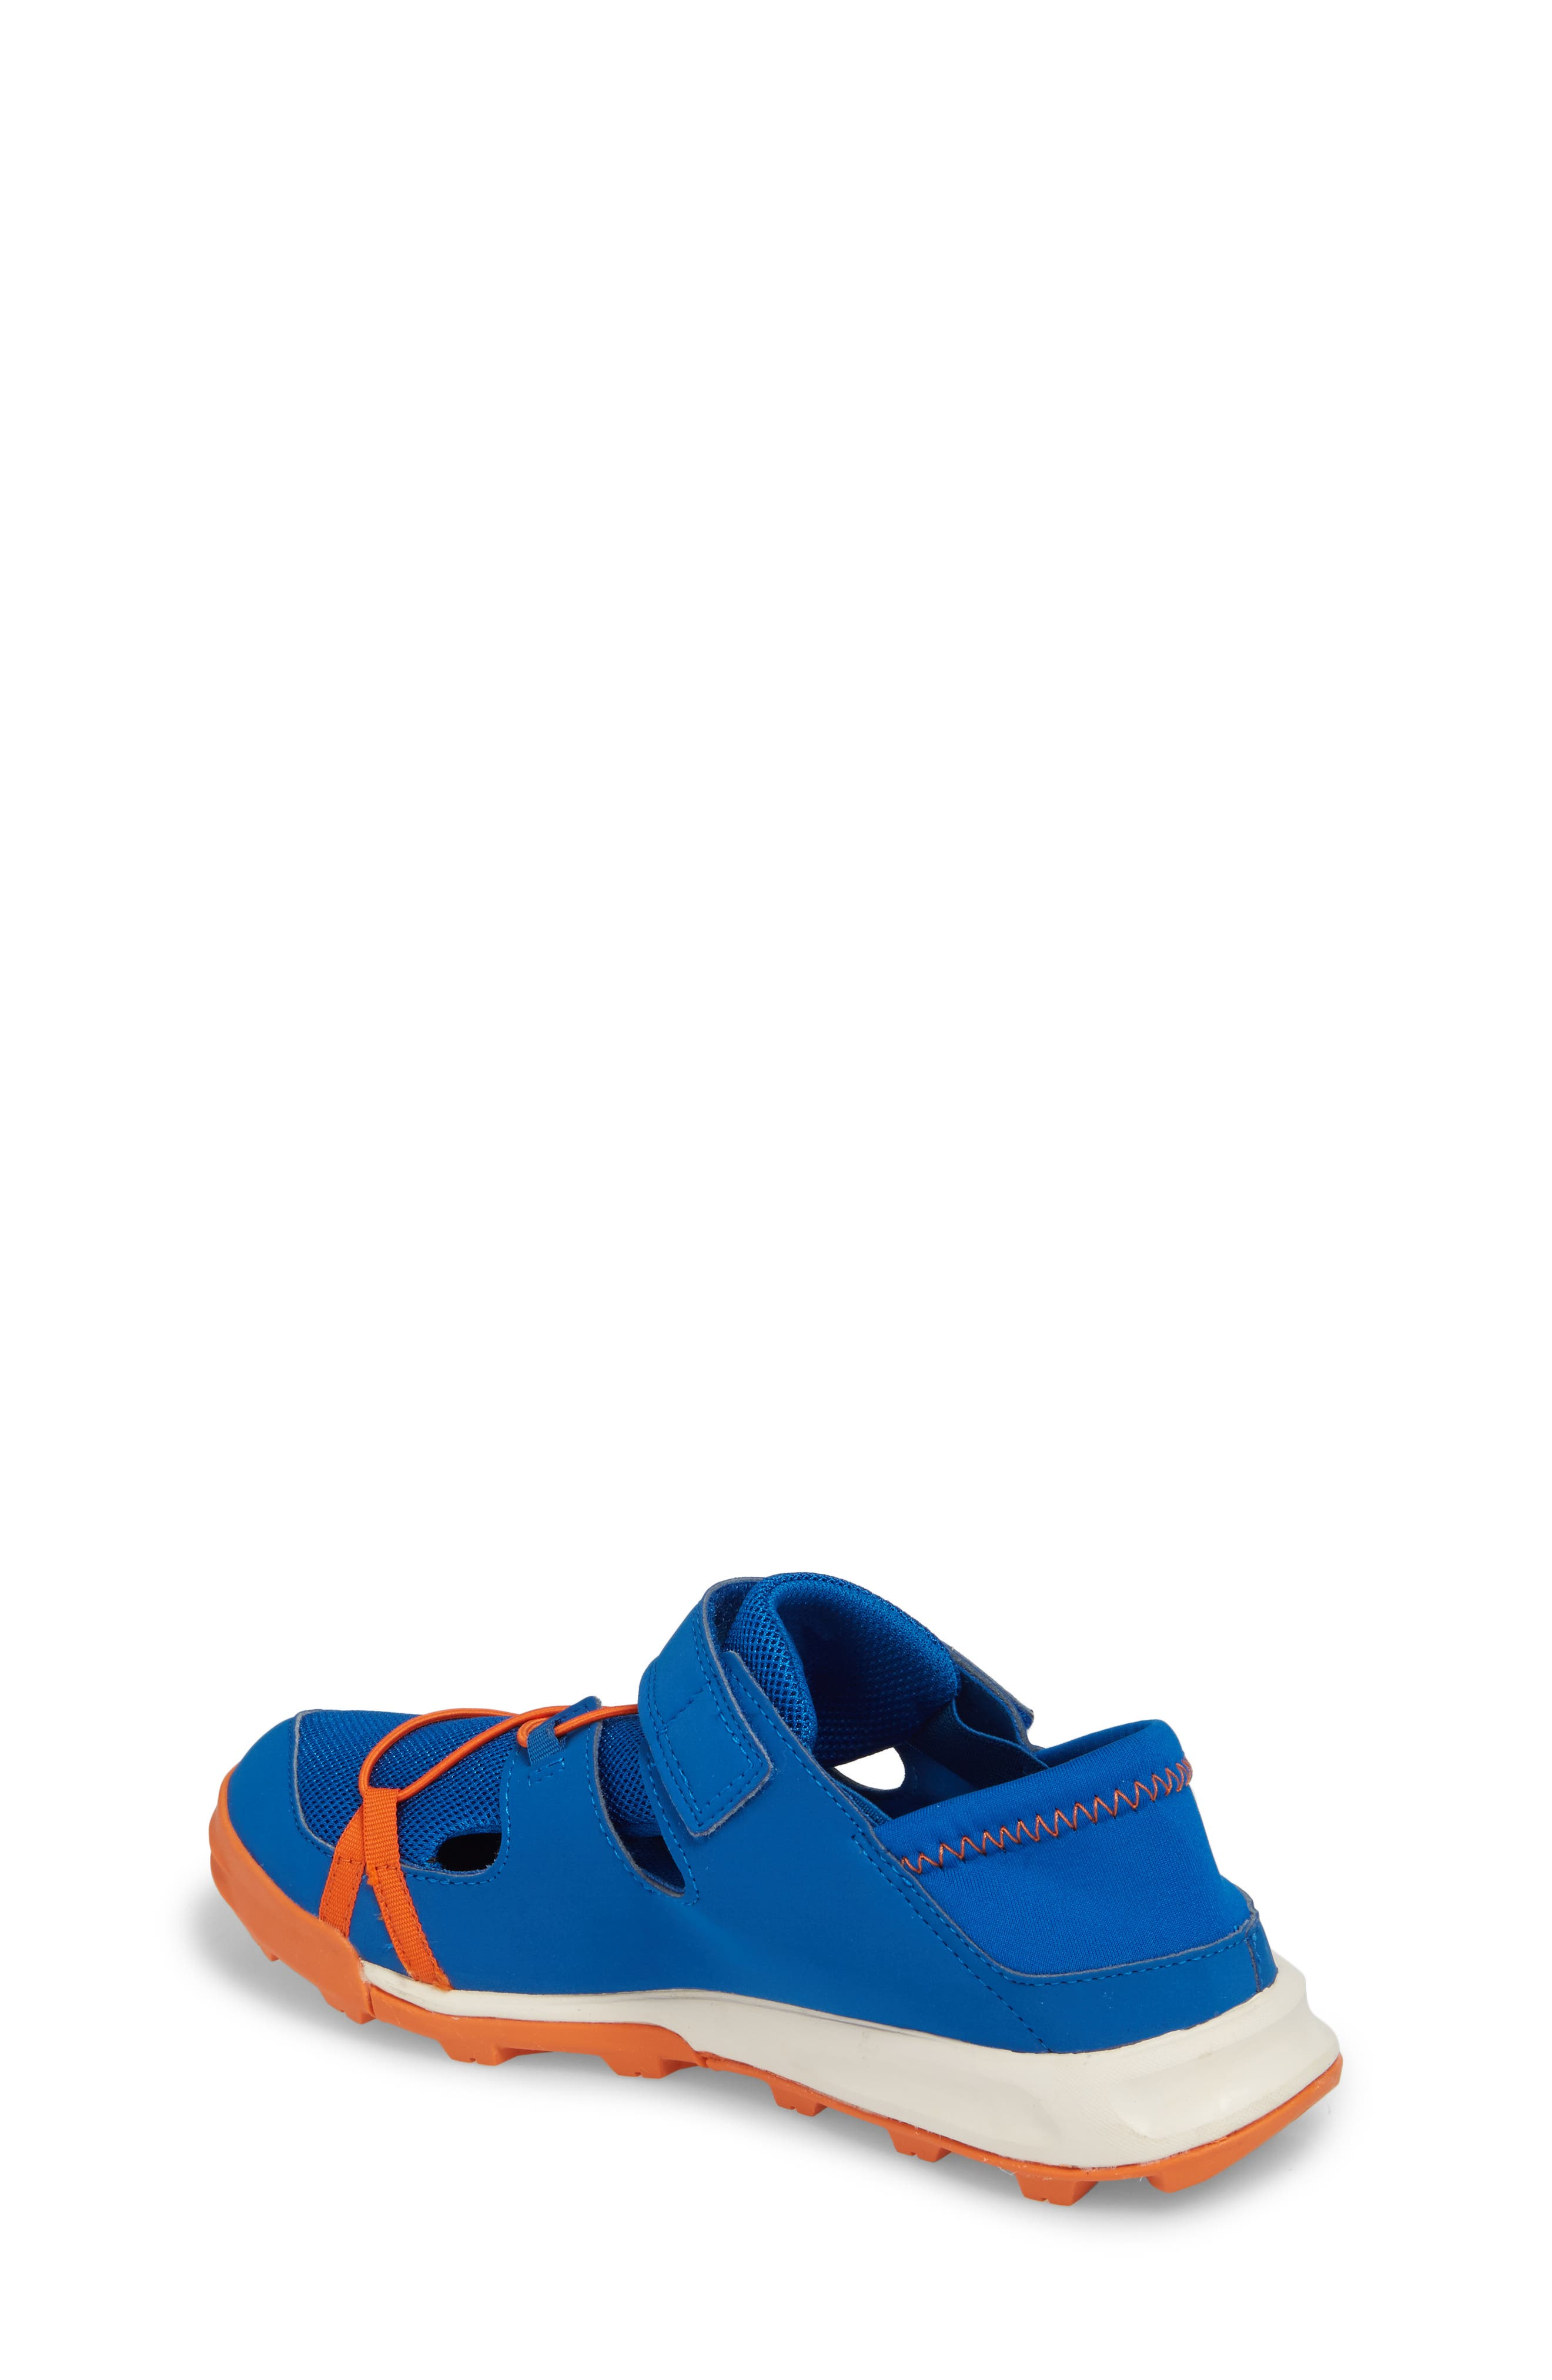 Terrex Tivid Sneaker,                             Alternate thumbnail 2, color,                             Blue/ Orange/ Chalk White